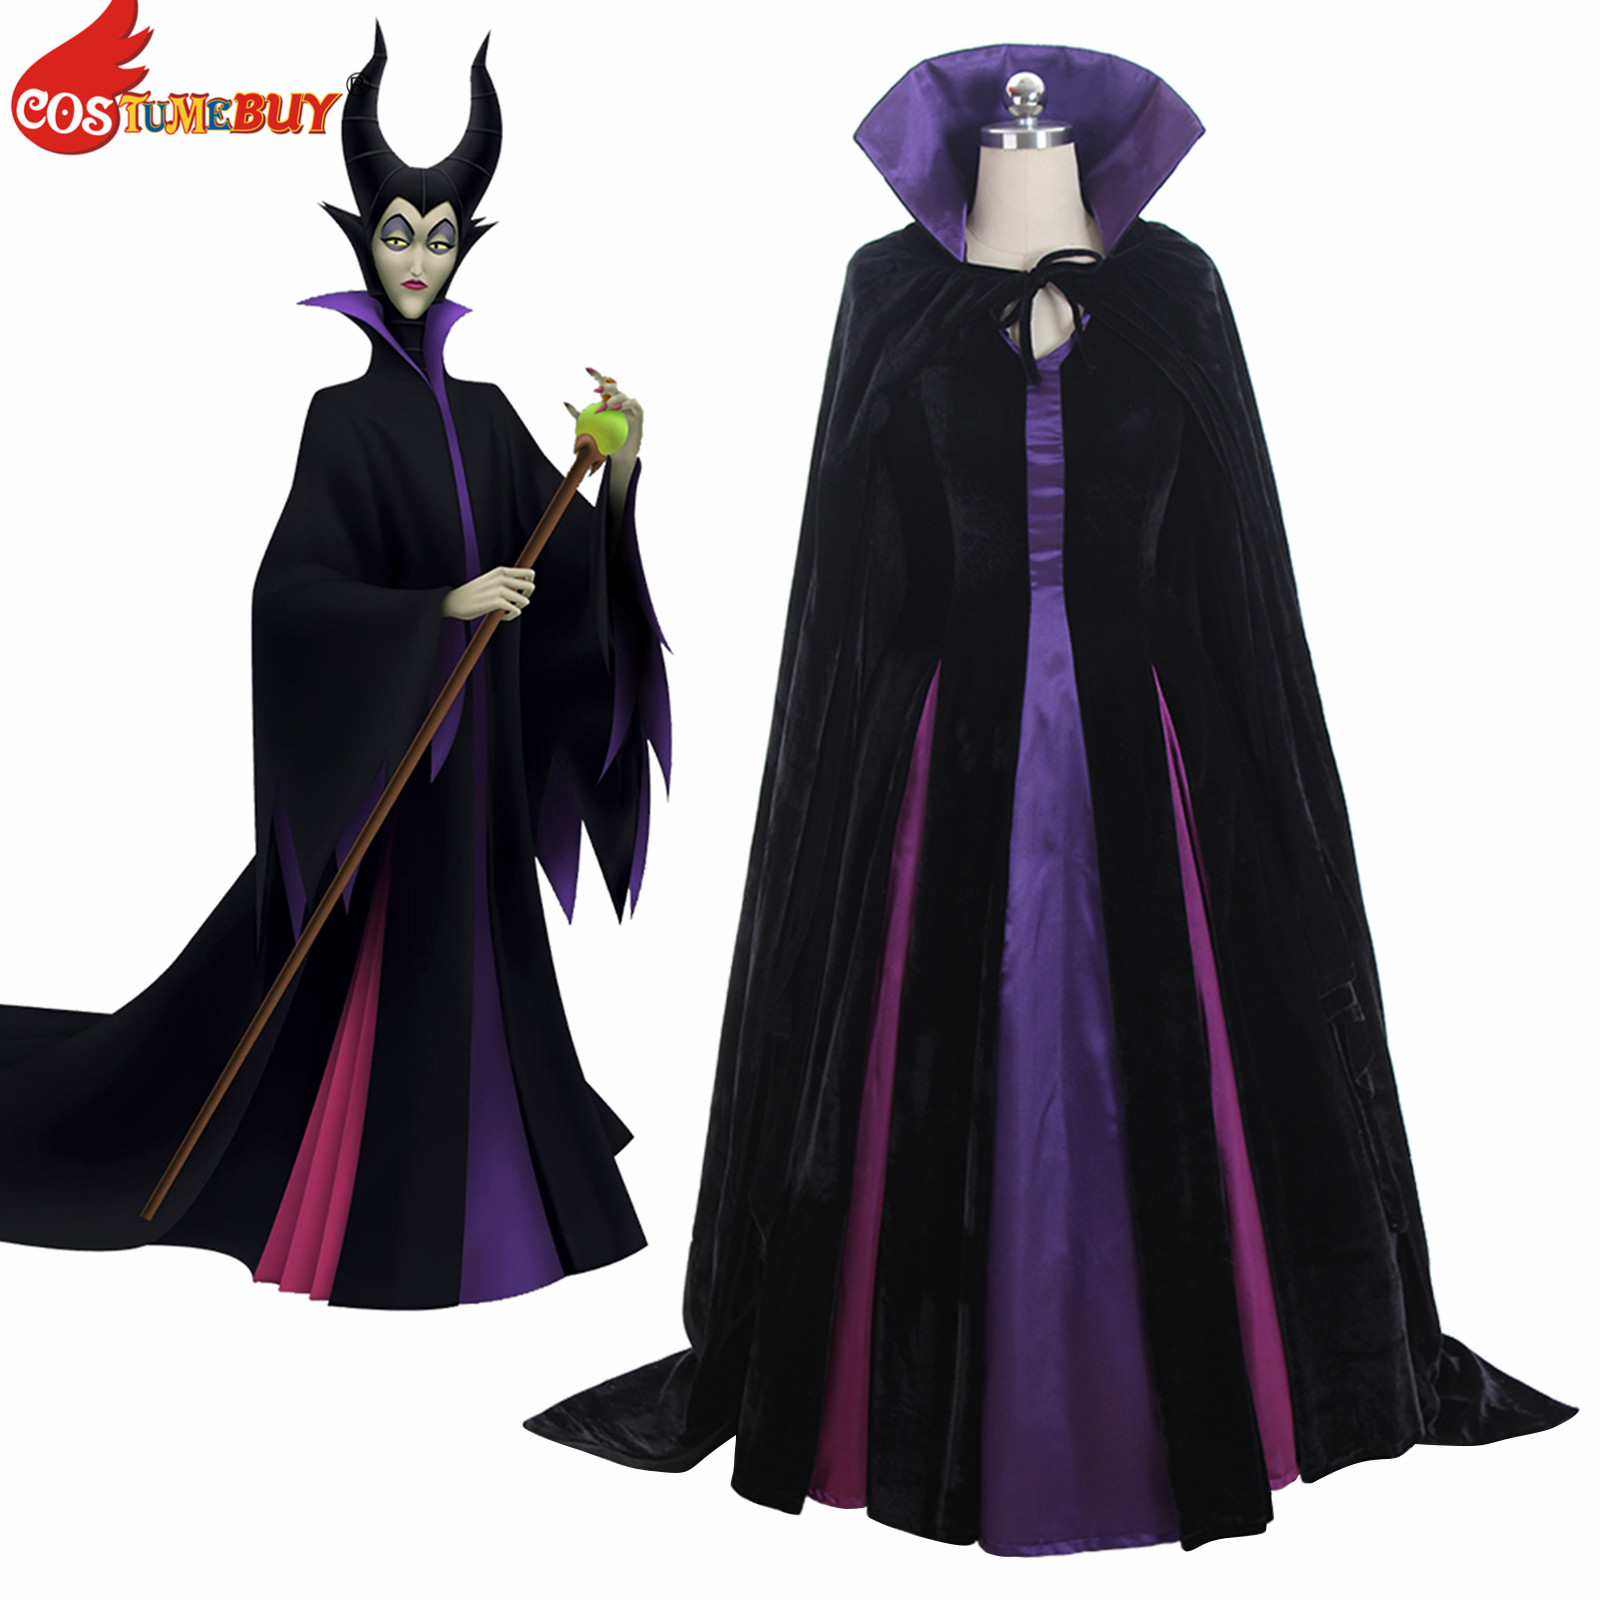 Costume Maleficent Costume maléfique reine du mal Cosplay robe tenue dames fantaisie robe femmes Halloween Costume de fête sur mesure